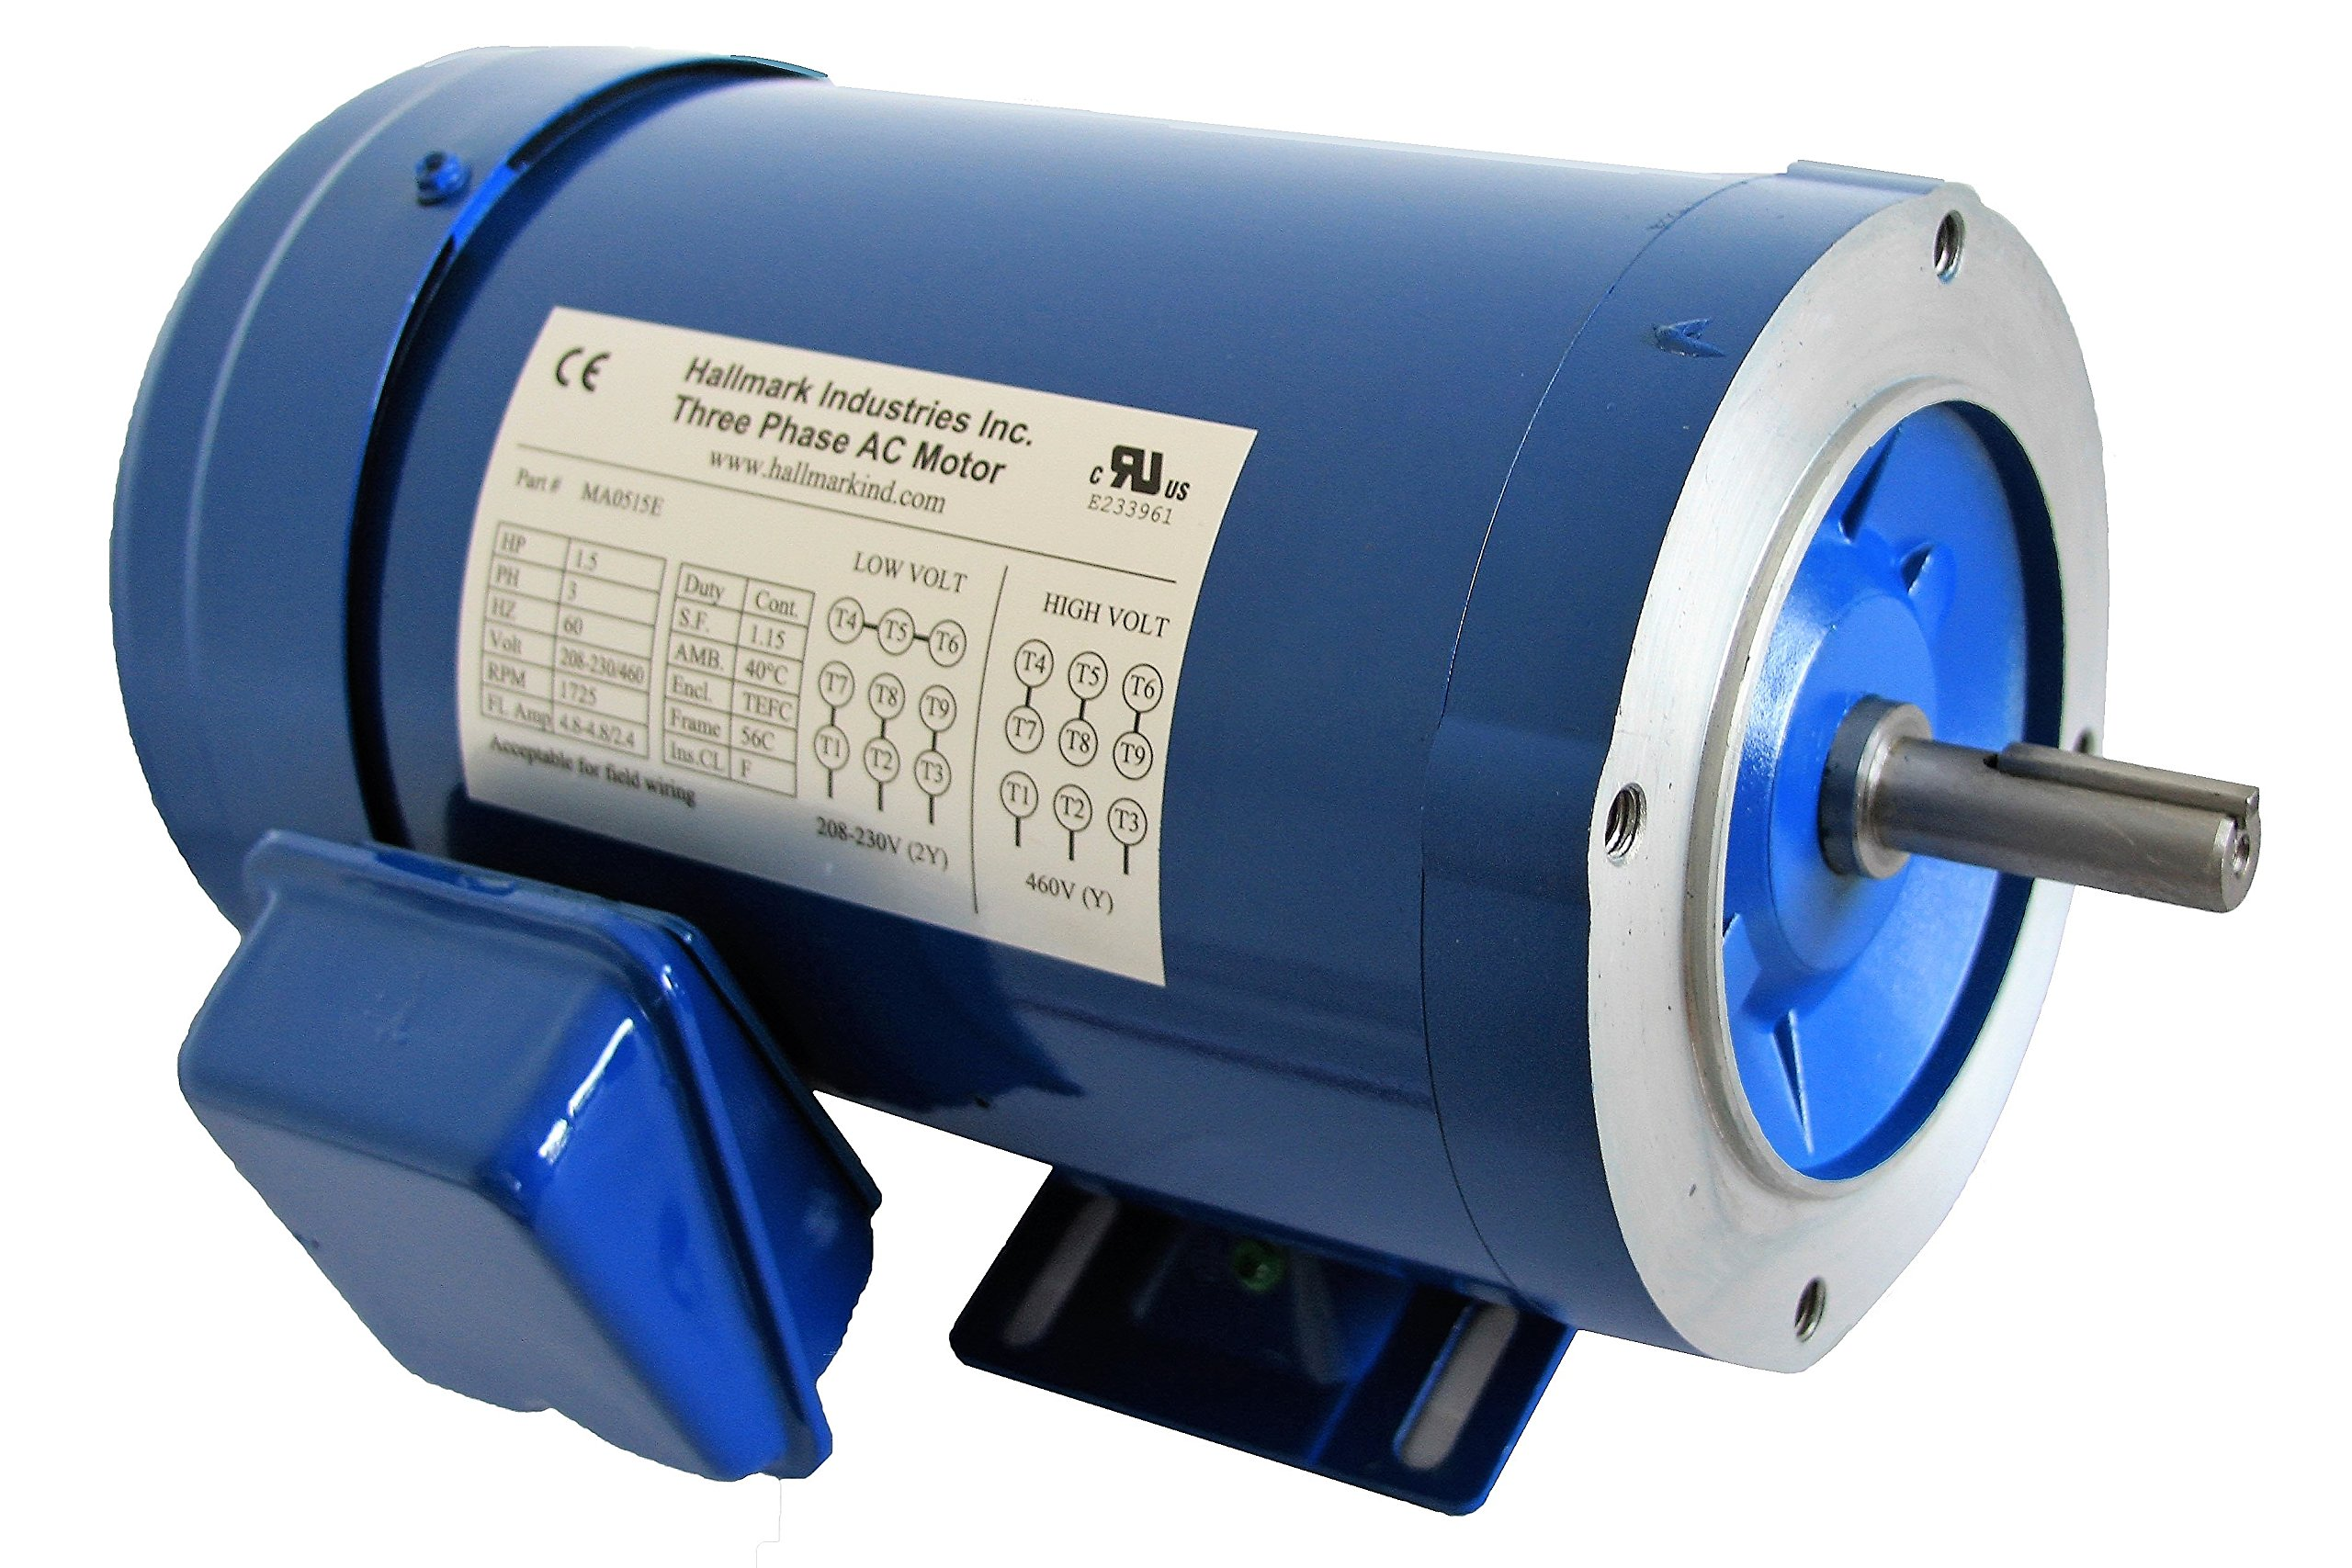 Hallmark Industries MA0505E AC Motor, 1/2 hp, 1725 RPM, 3PH/60 Hz,  208-230/460 VAC, 56C/TEFC with Foot SF 1 15 Class F Insulation, Inverter  Duty (Pack